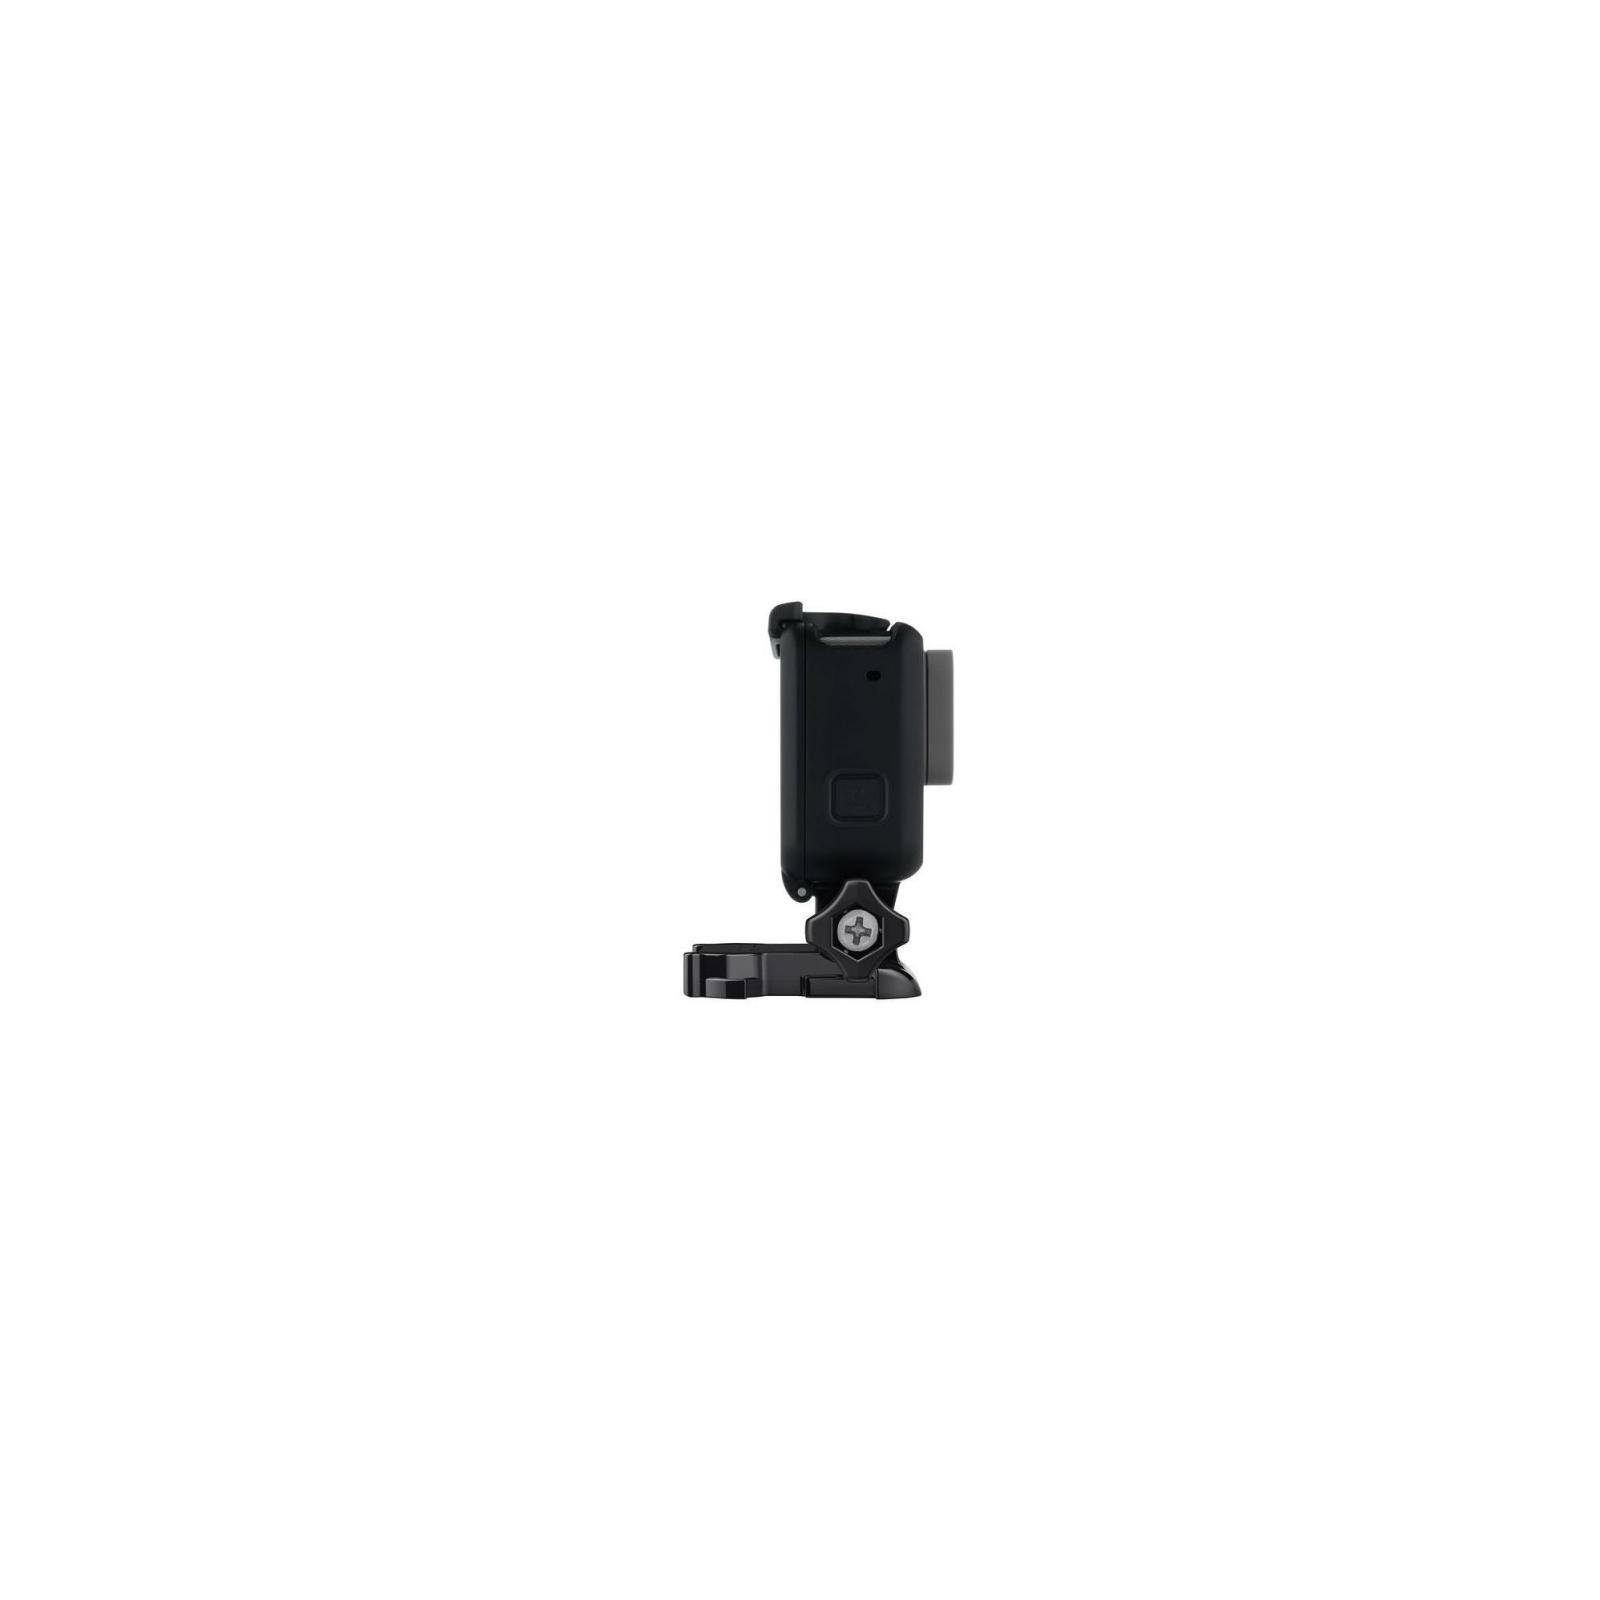 Аксессуар к экшн-камерам GoPro The Frame (AAFRM-001) изображение 3